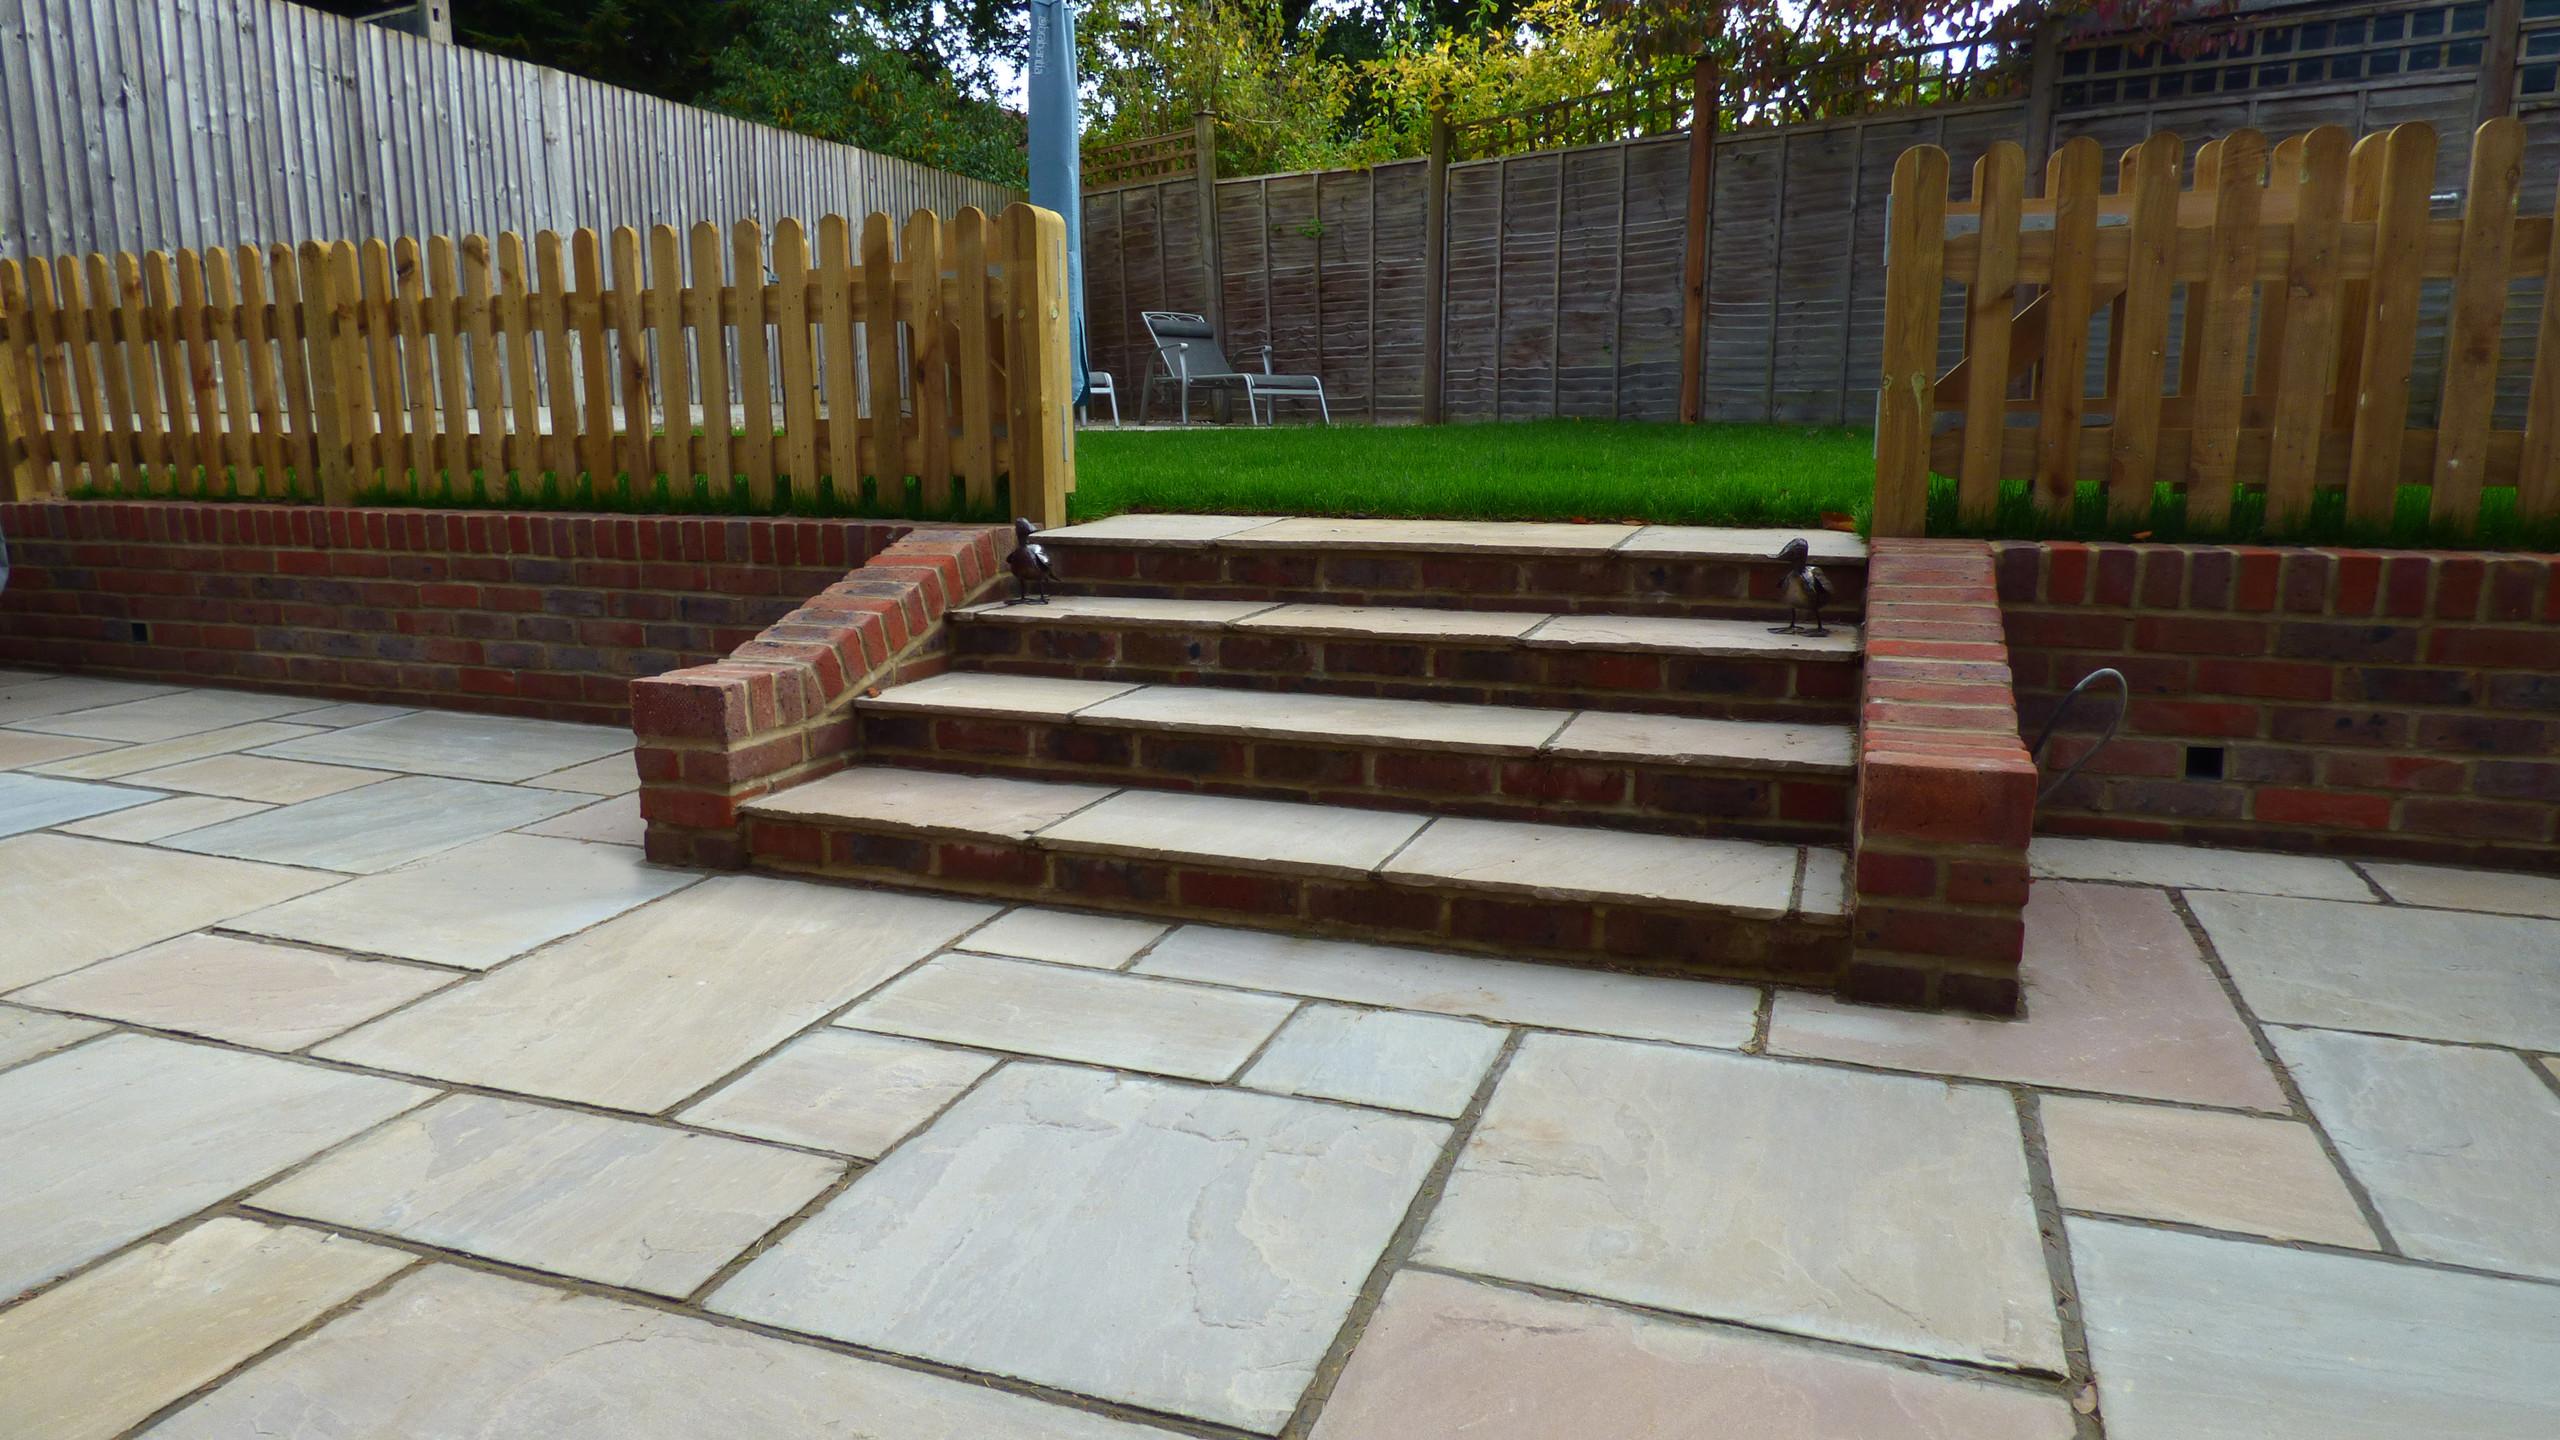 Brett Rivern Sandstone in Forest Glen patio with steps